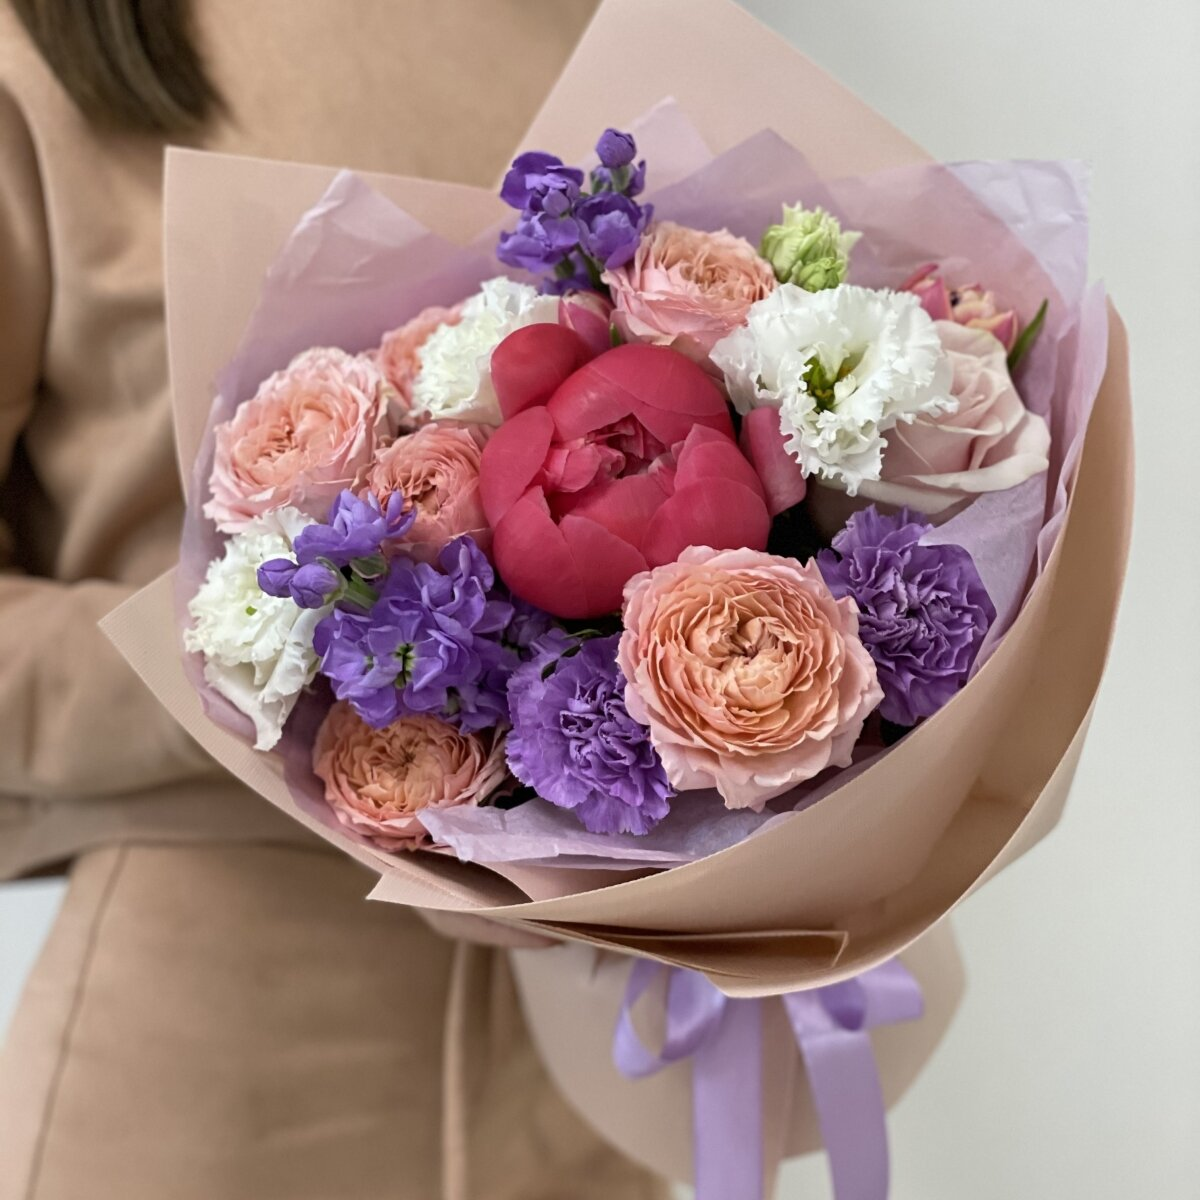 Букет Мэрилин из пиона, маттиолы, роз и диантуса